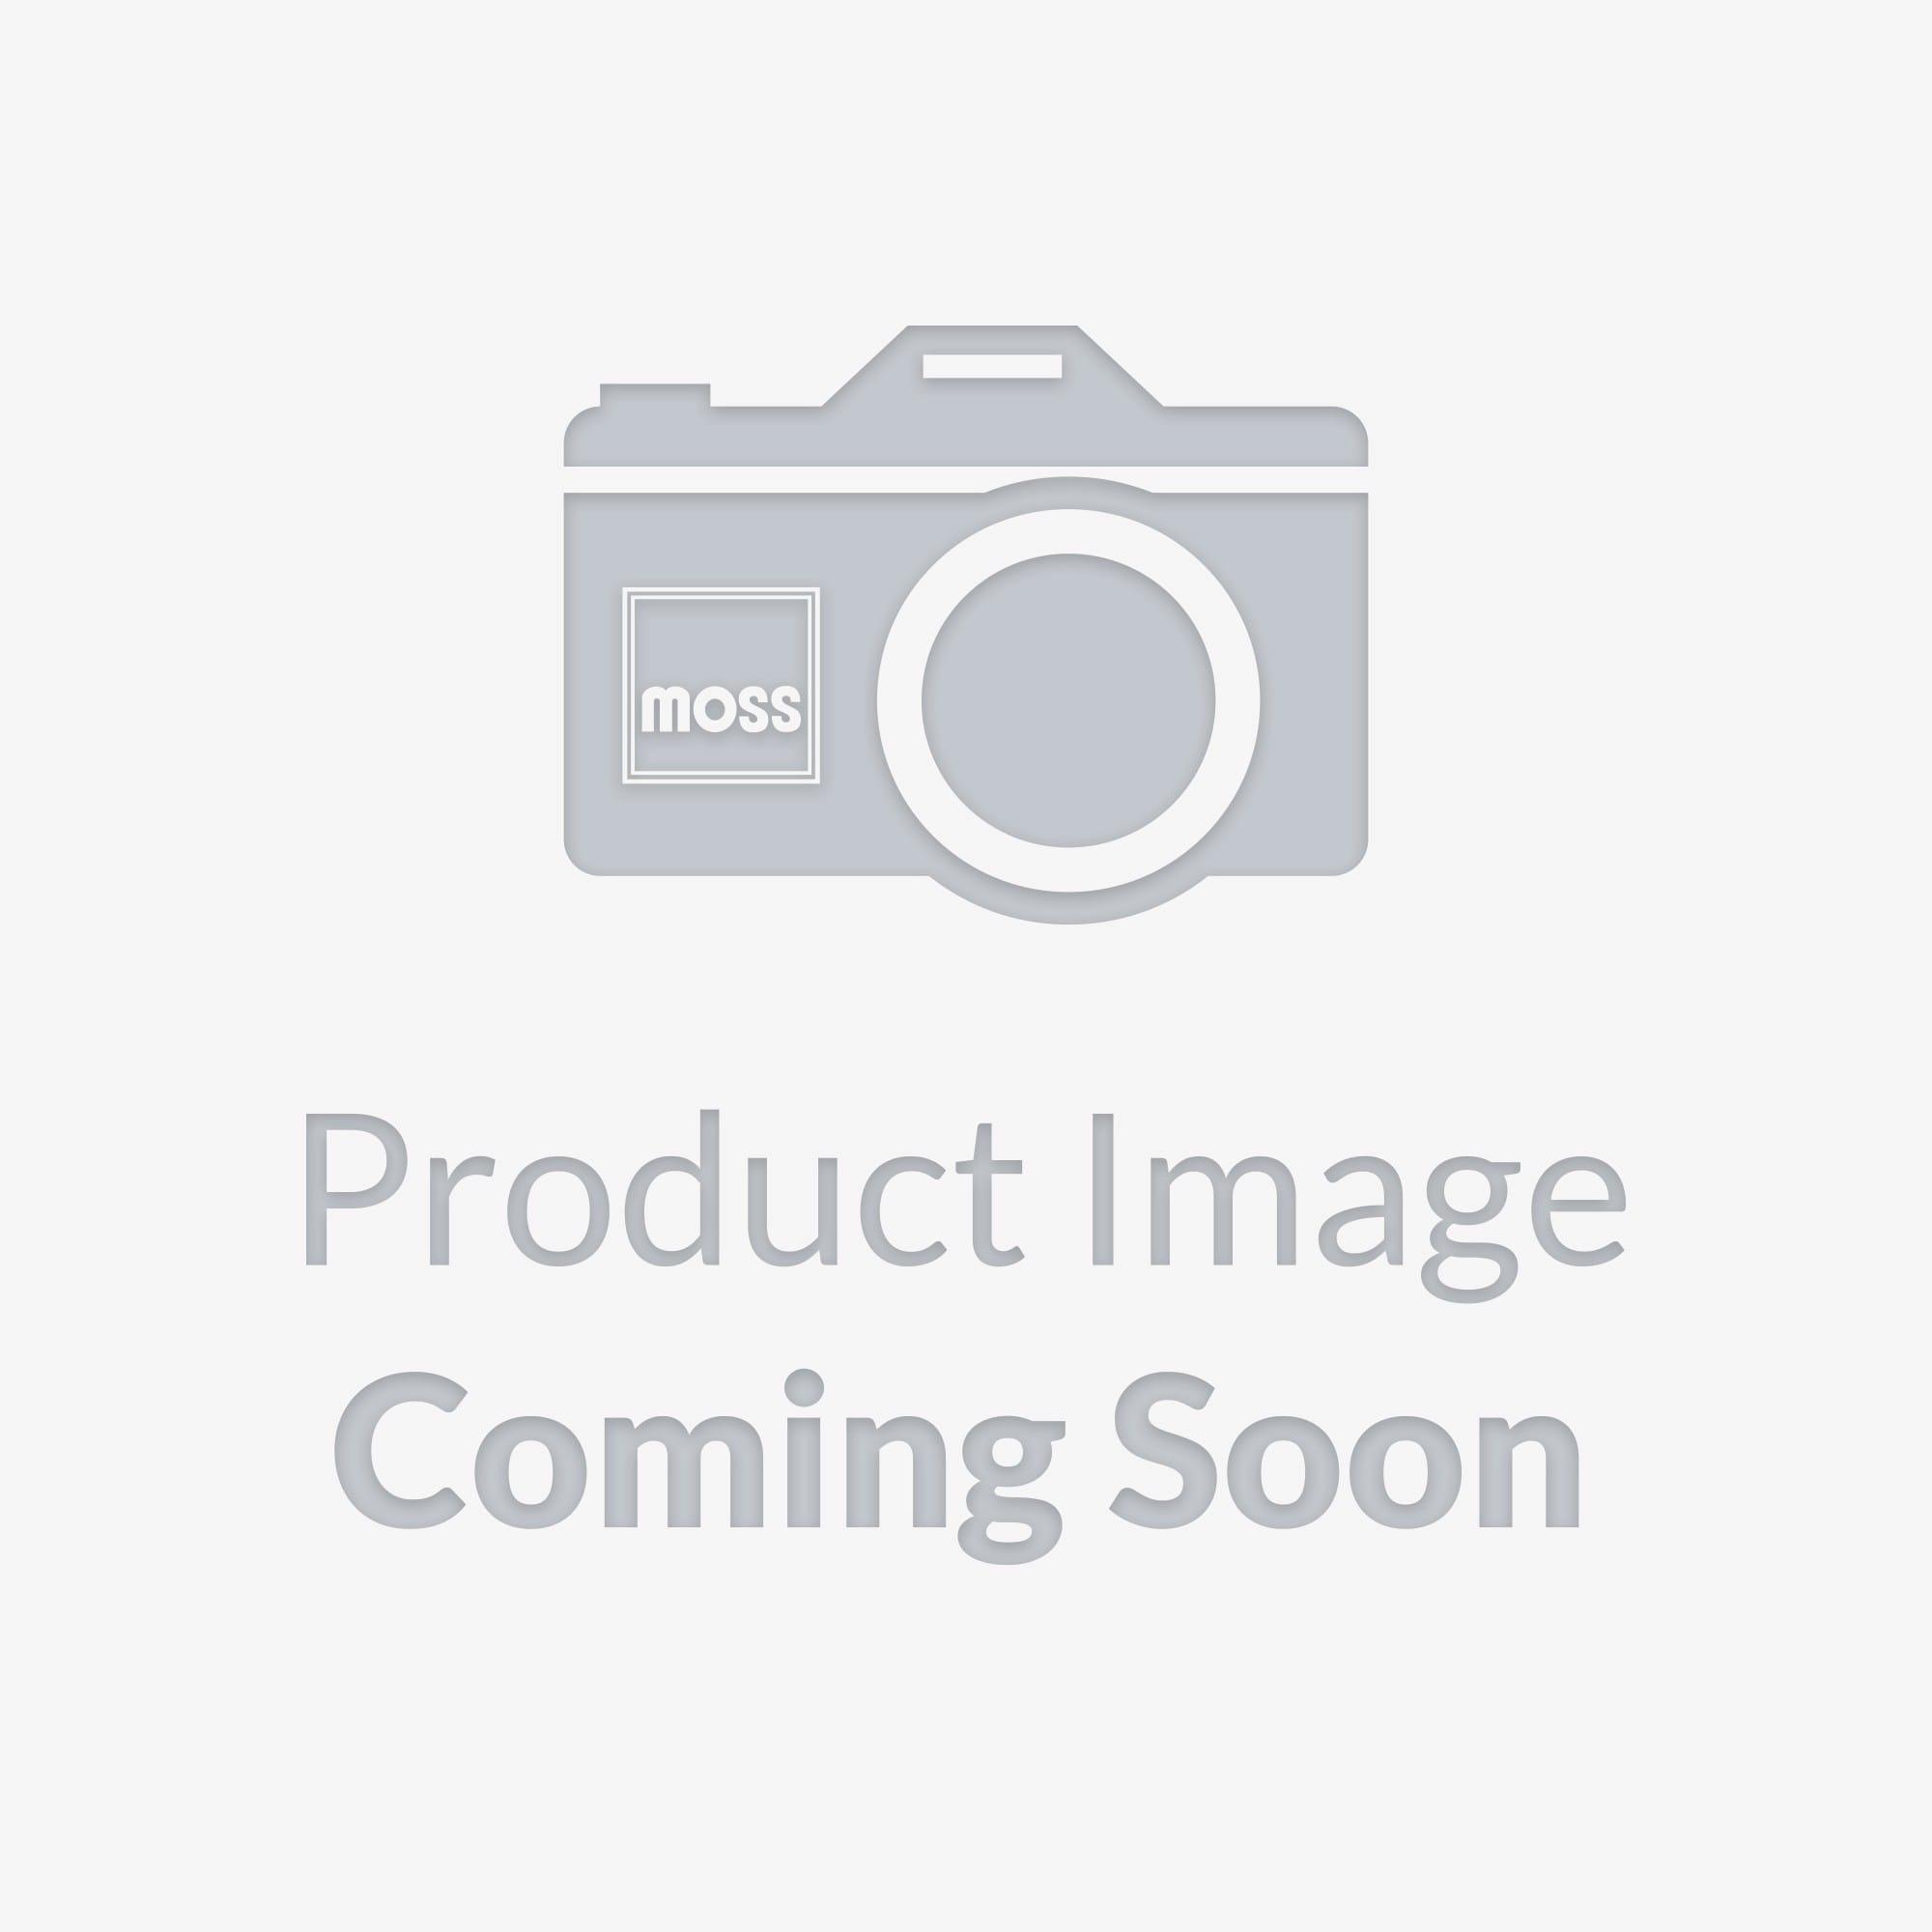 Silverguard plus car cover moss motors for Moss motors used cars